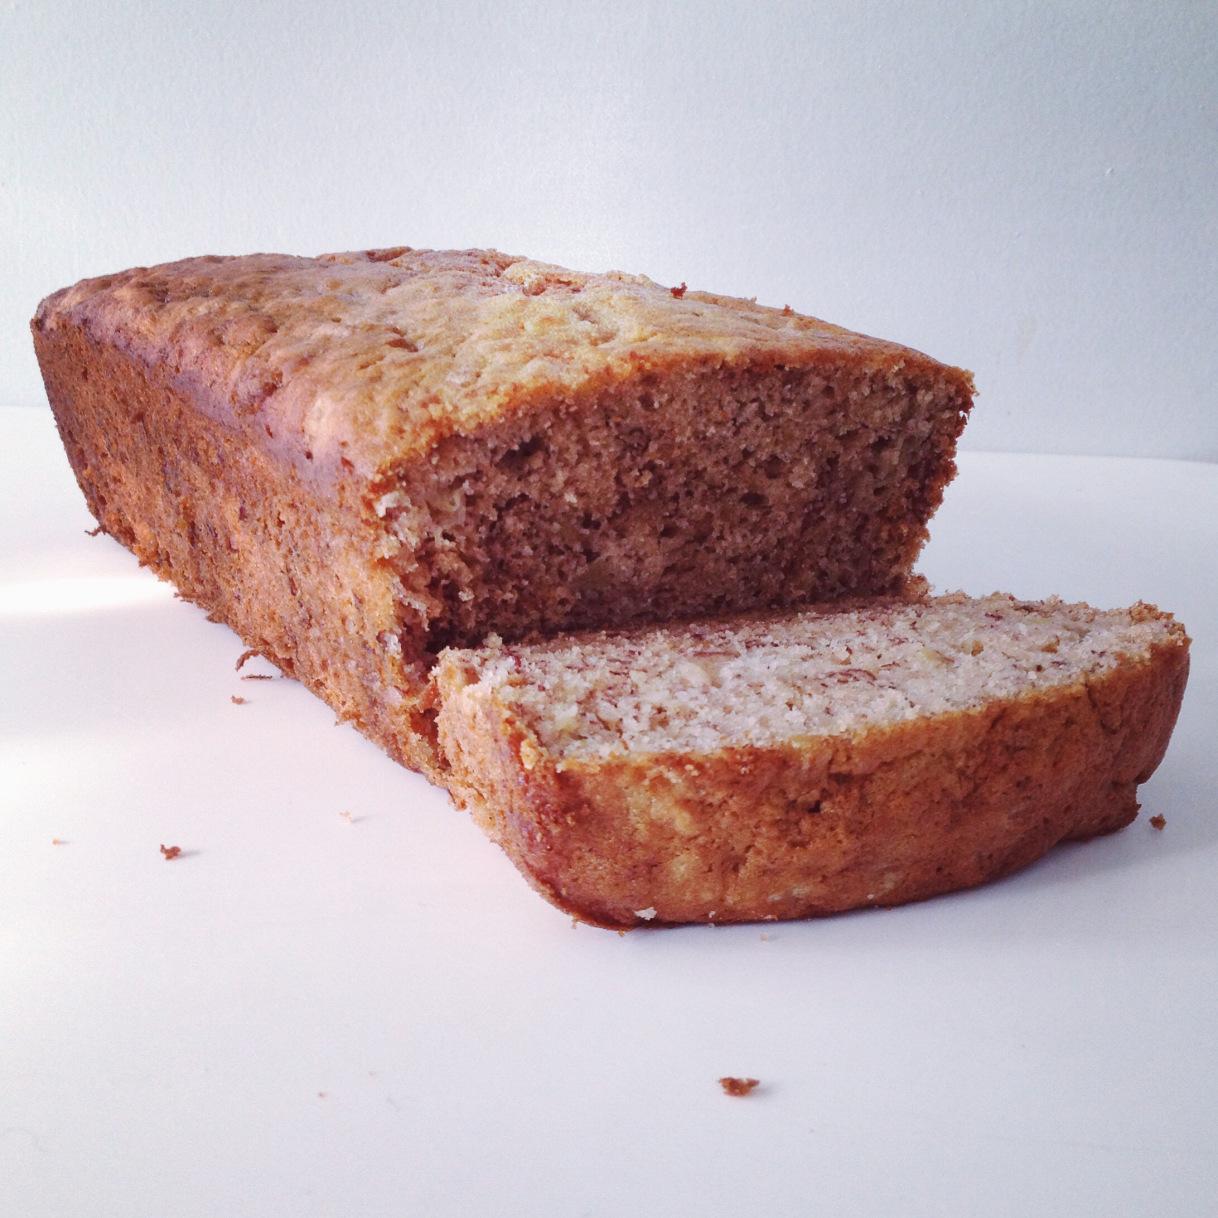 The Little Loft - banana bread cut